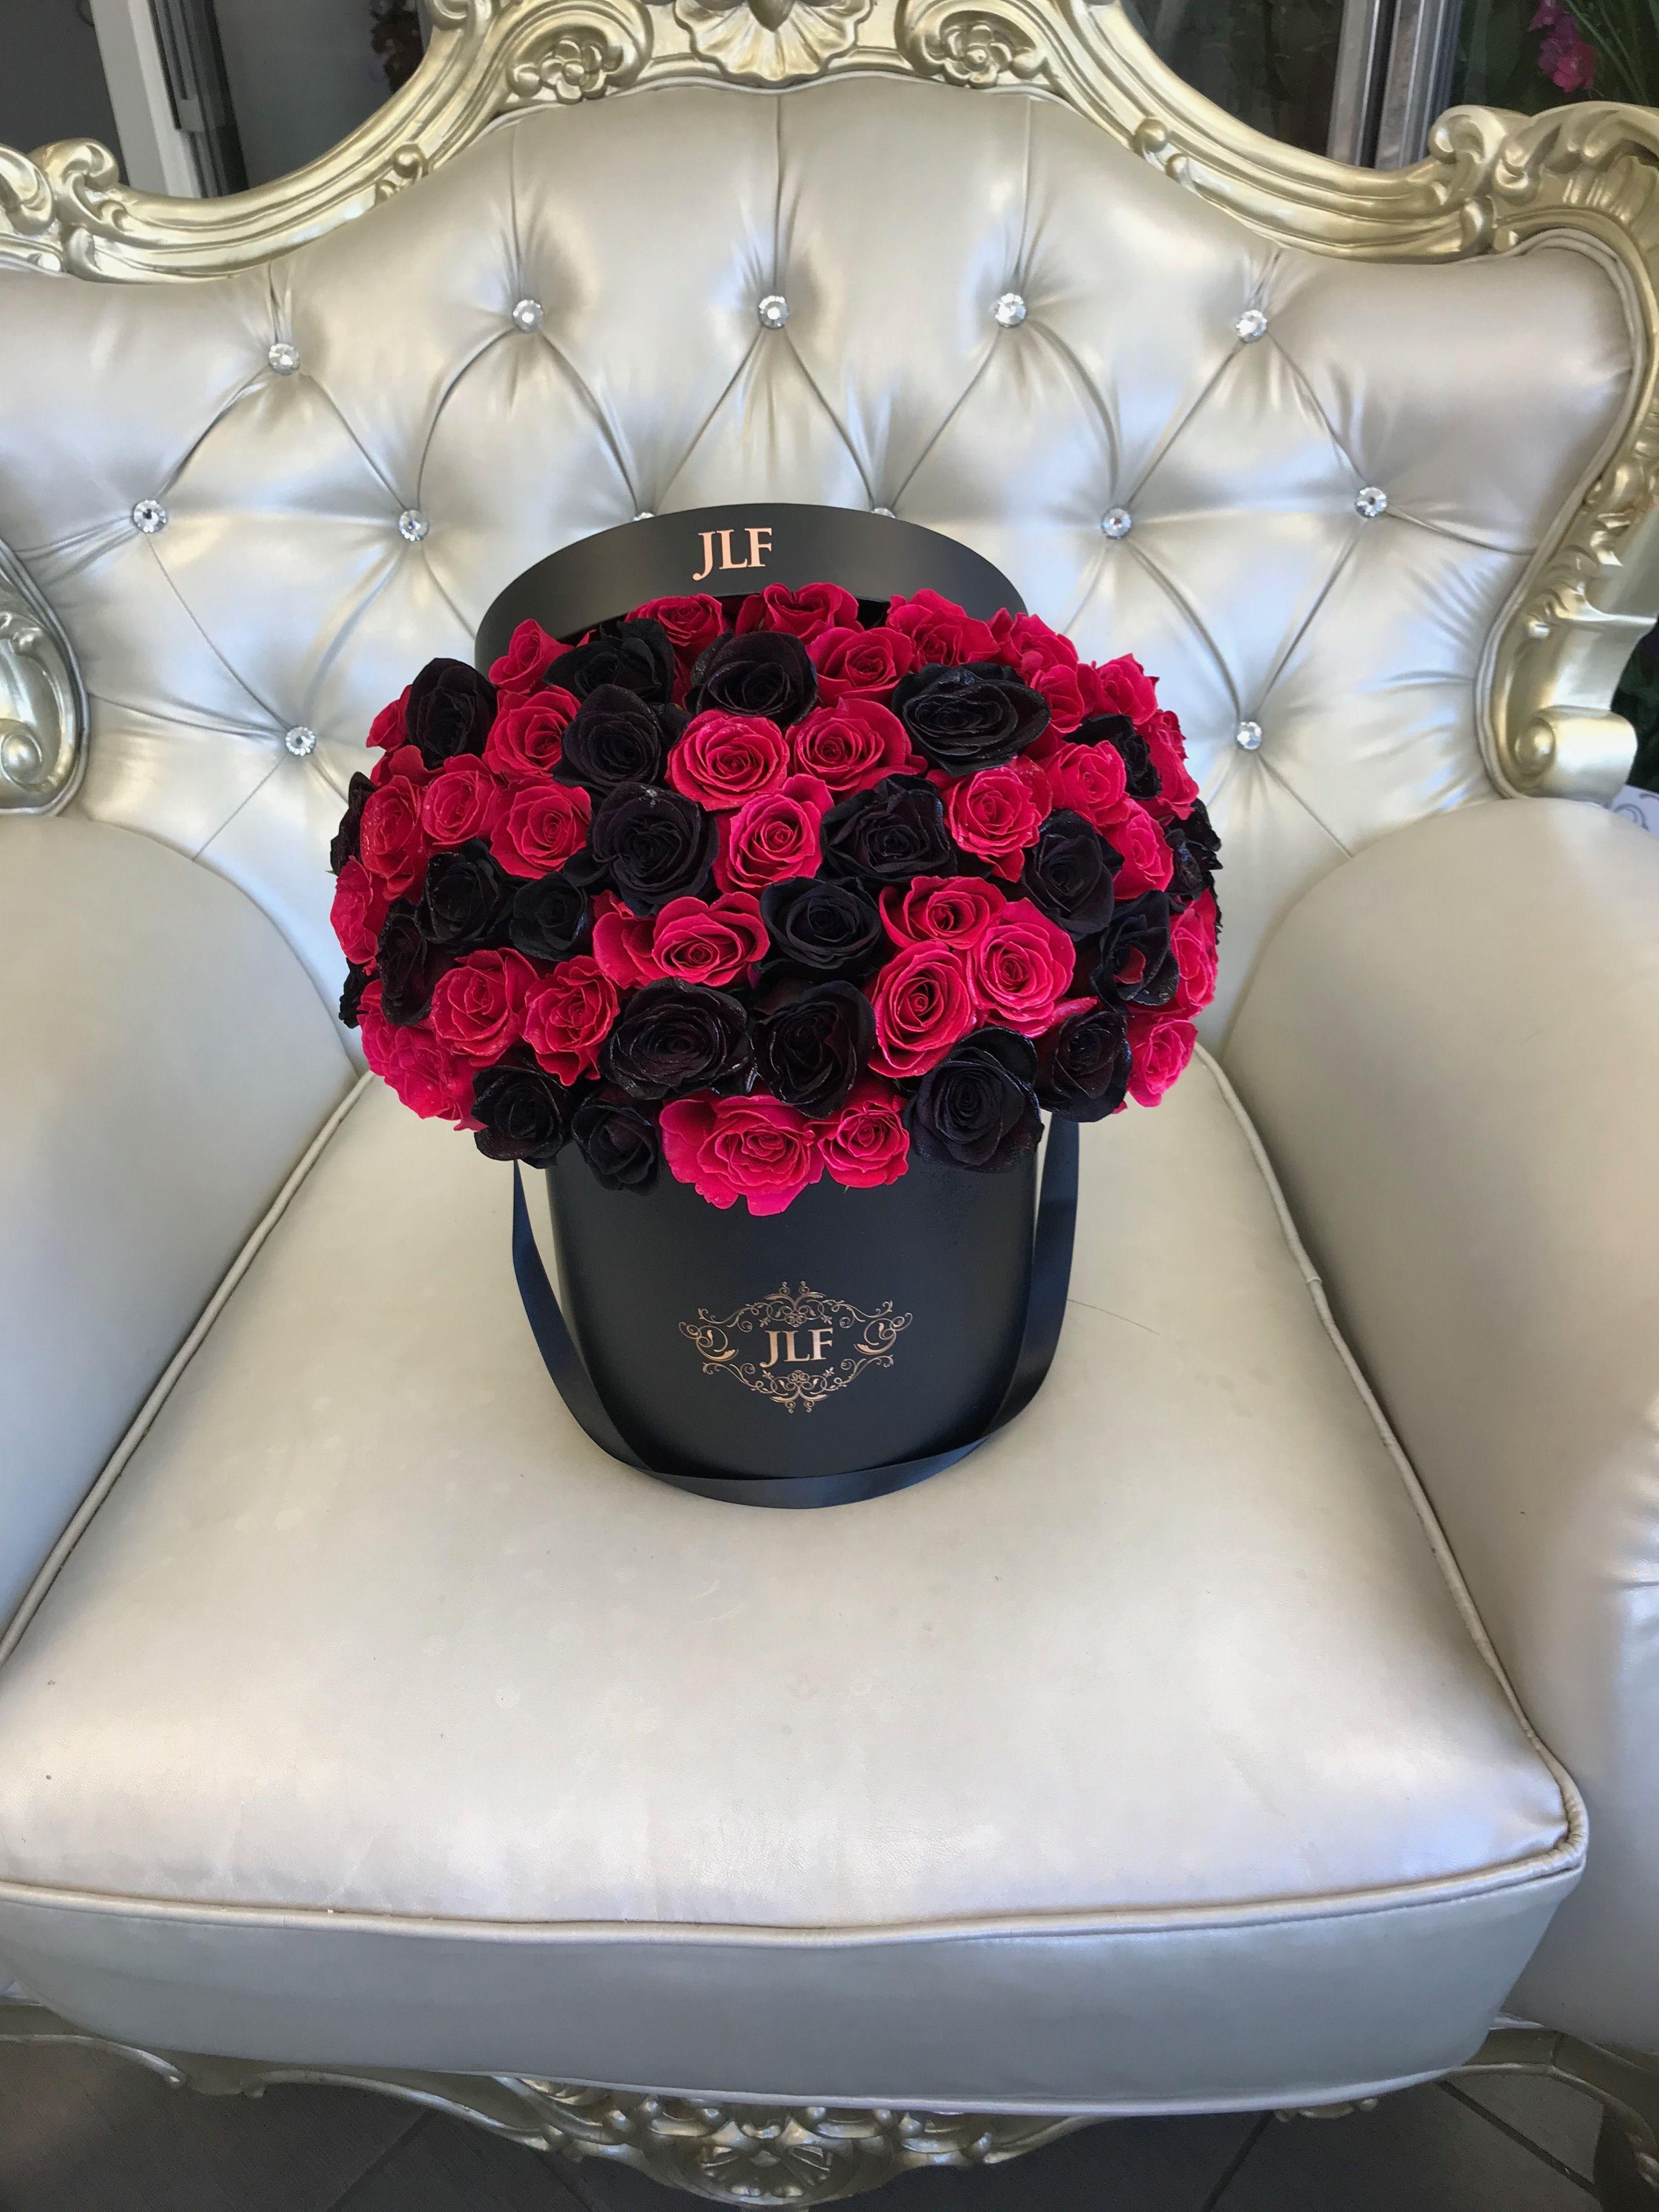 Pin By J Adore Les Fleurs On Bukety In 2020 Flower Arrangements Rose Floral Arrangements